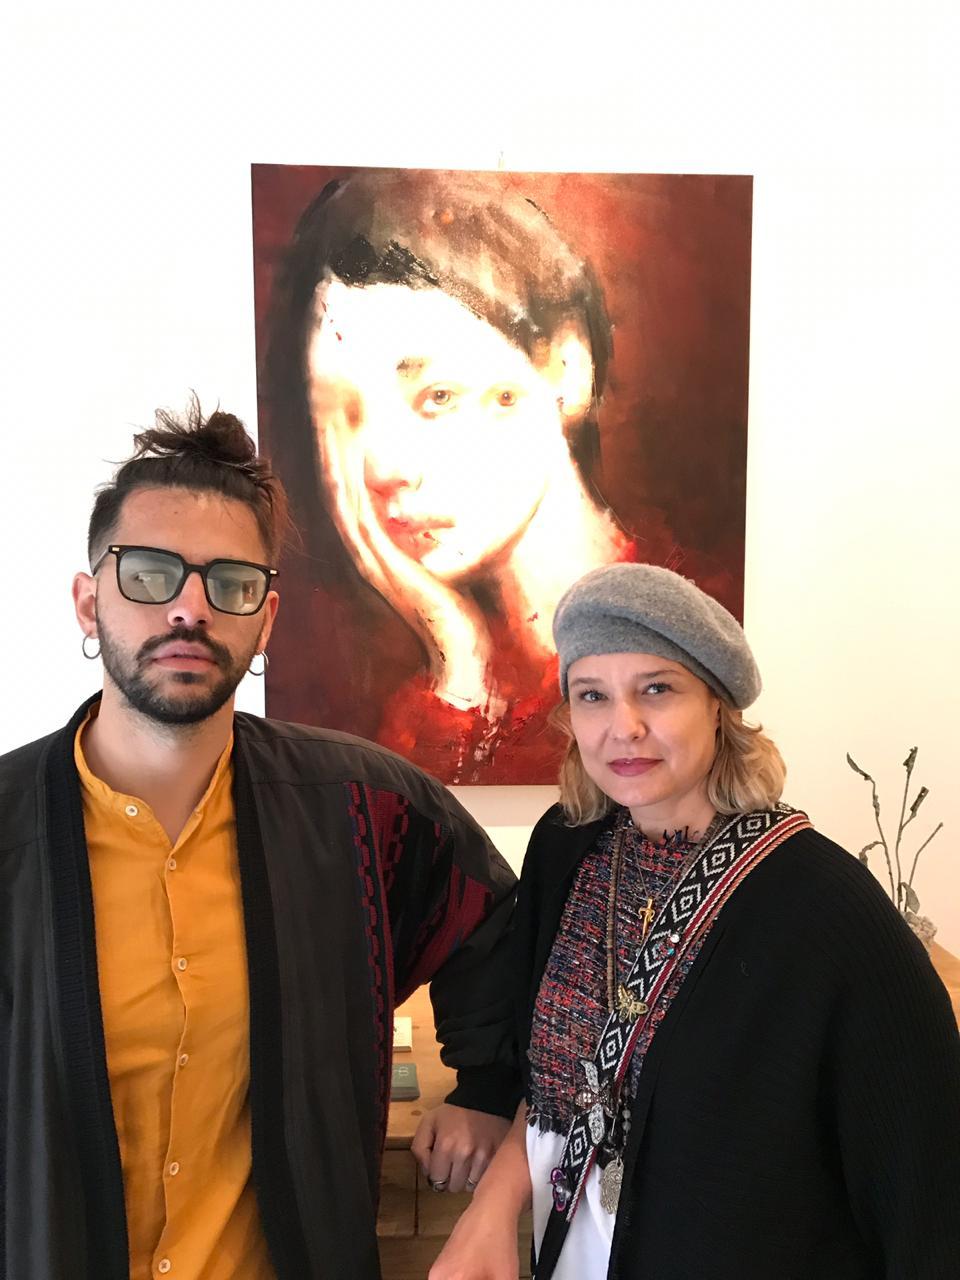 With artist Giuliano Macca